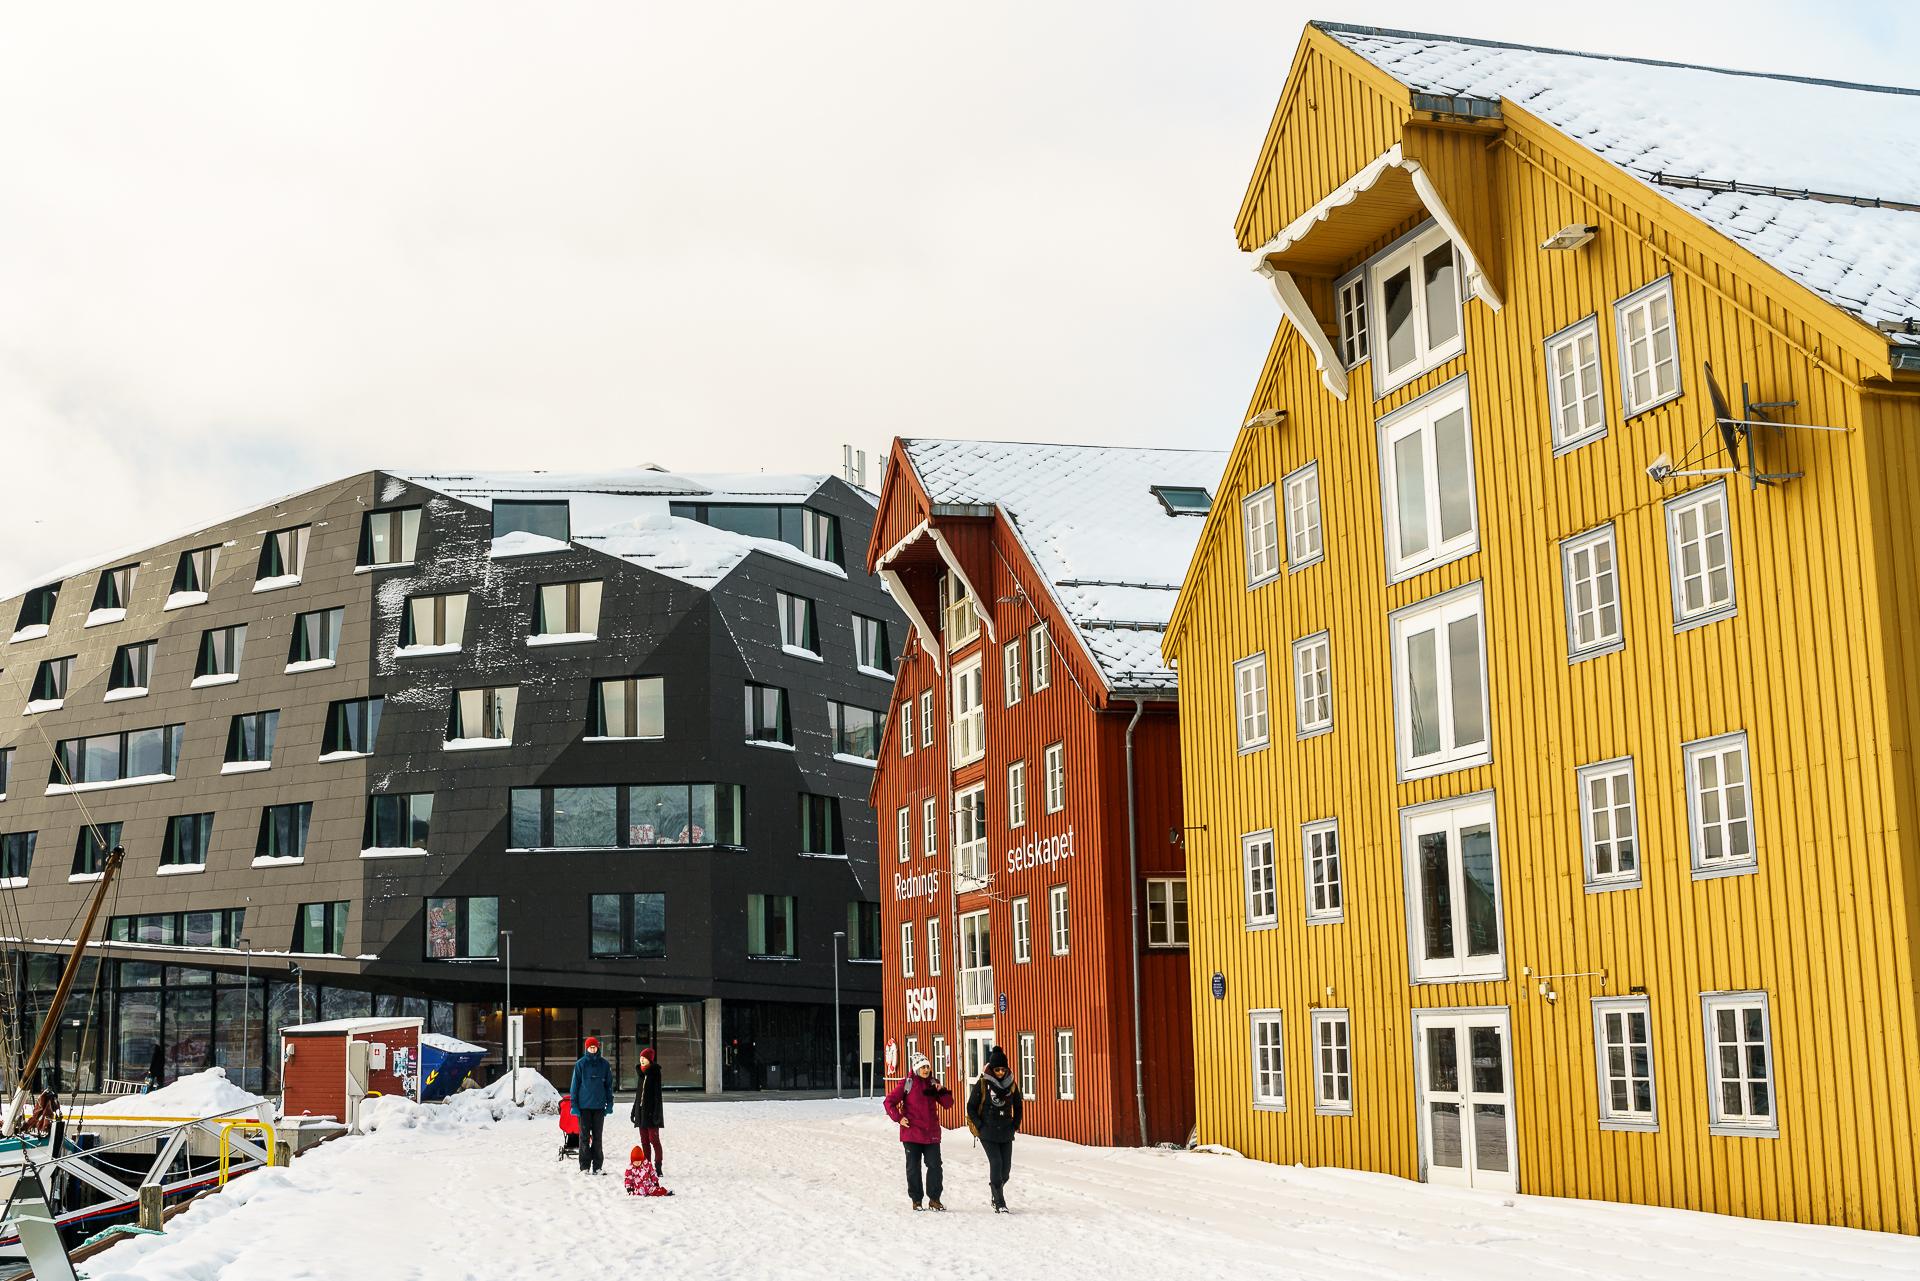 Tromso-Brygger